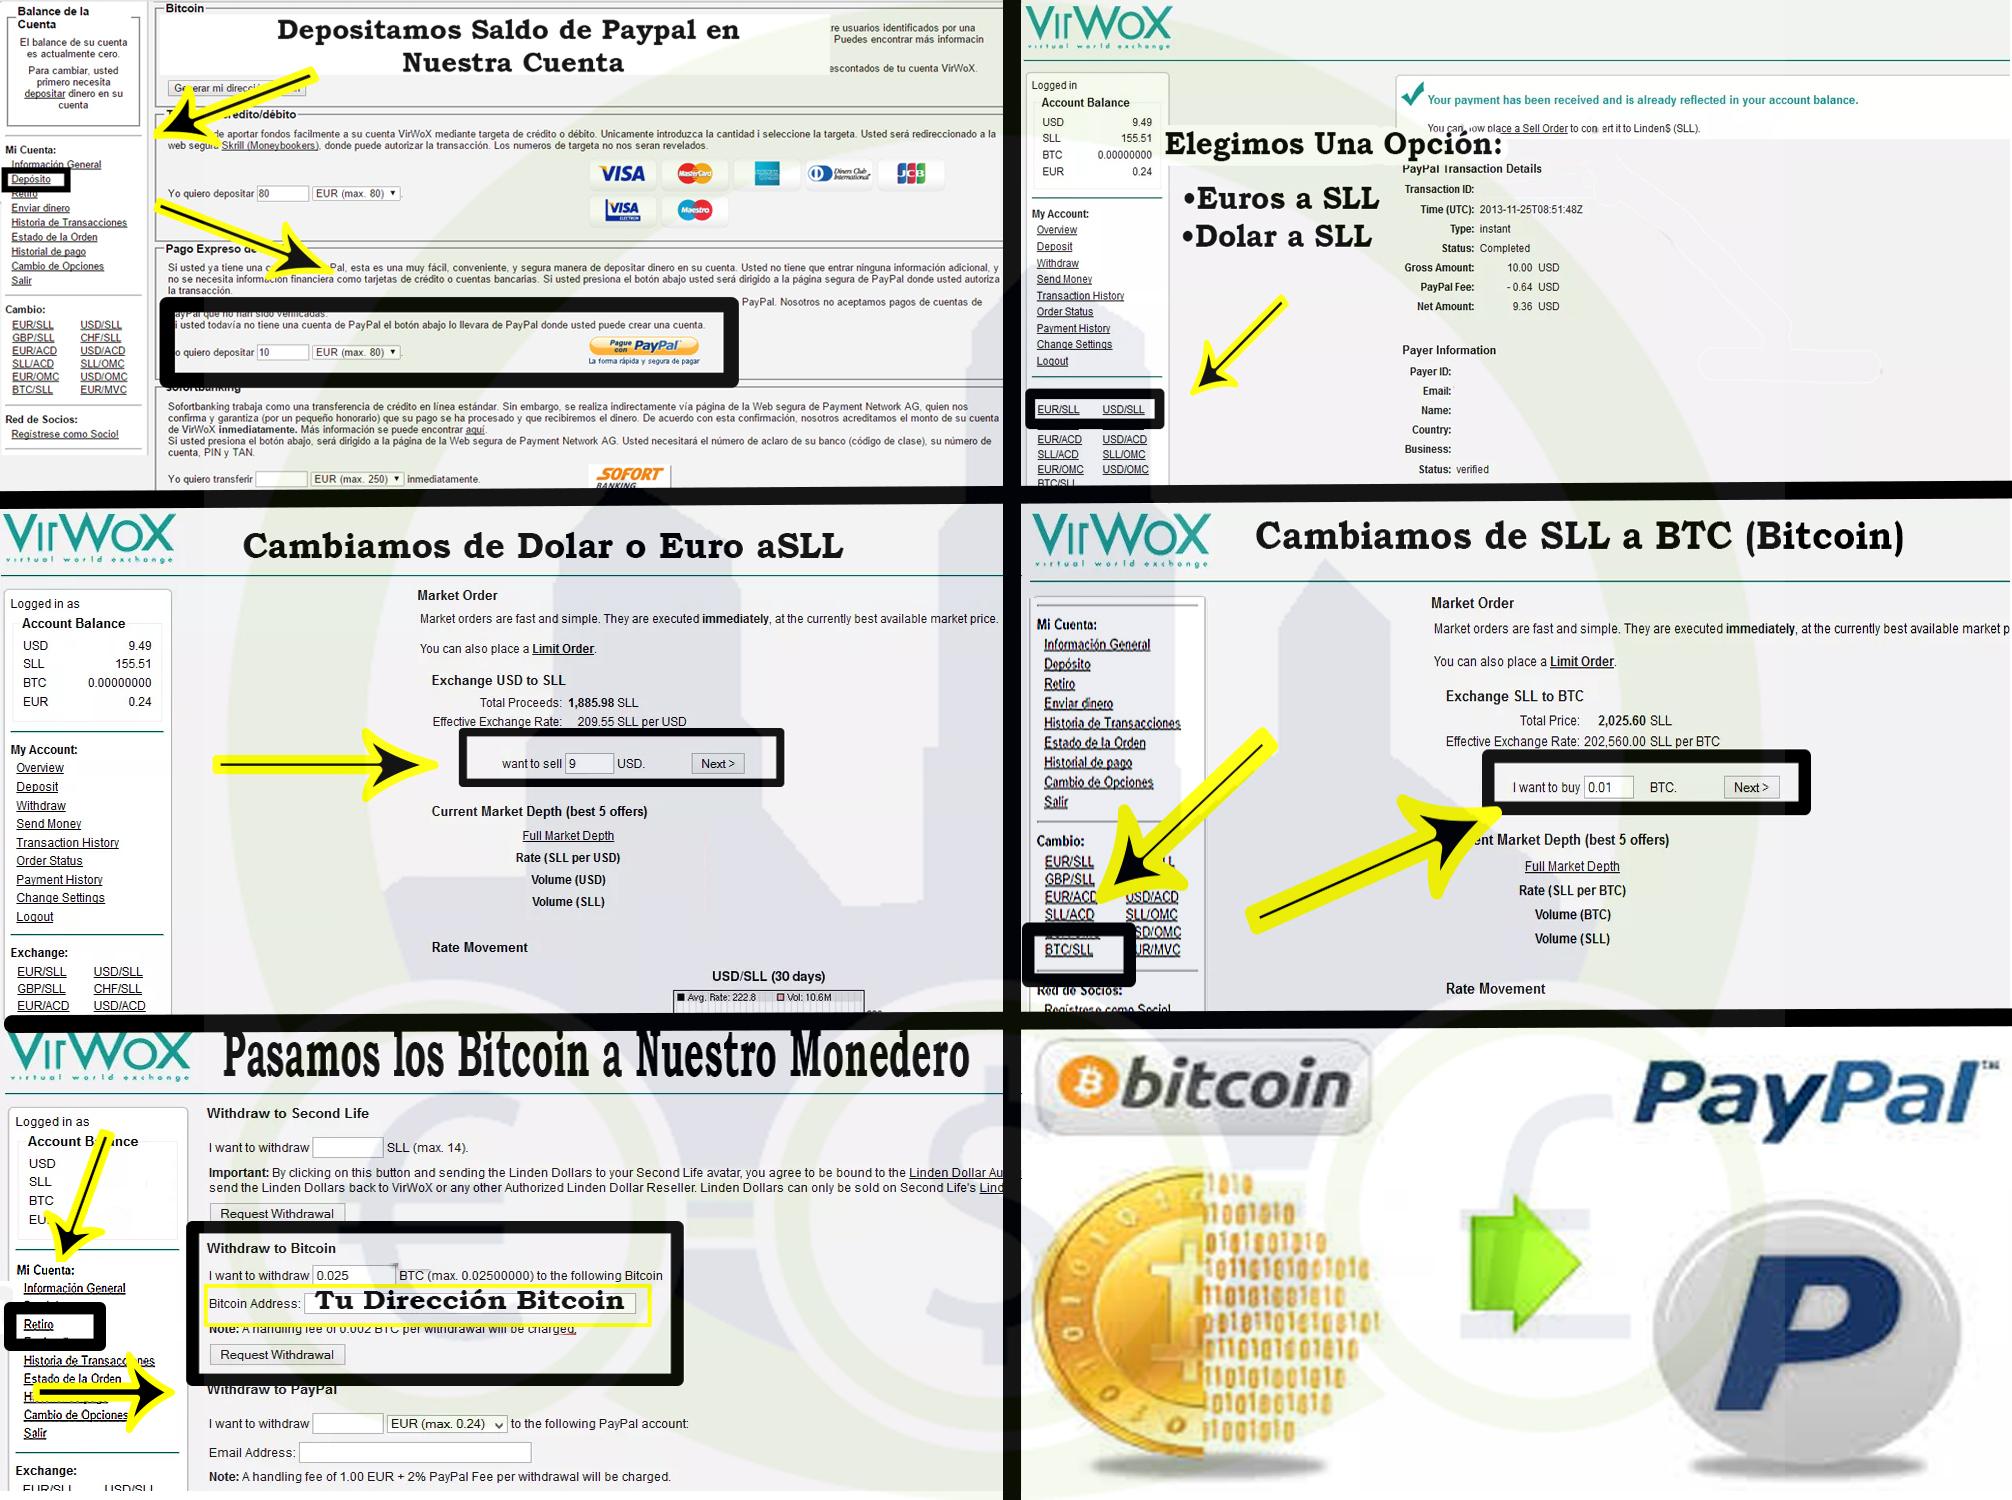 comprar bitcoins con paypal virwox